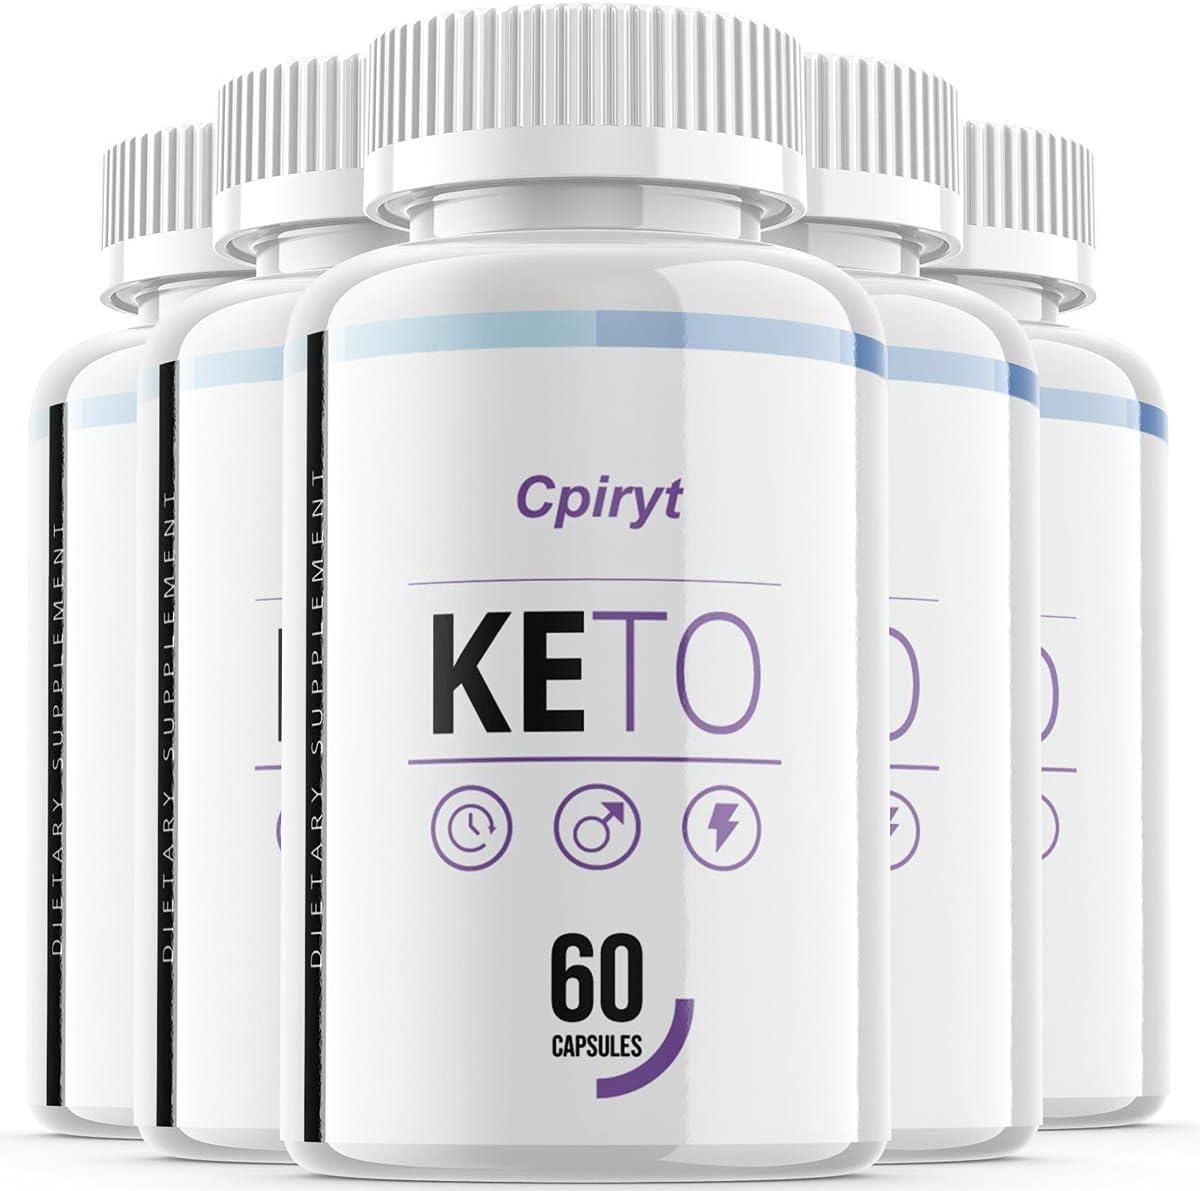 Cpiryt Keto Advanced Diet Pack Pills Super intense SALE Elegant Formula 5